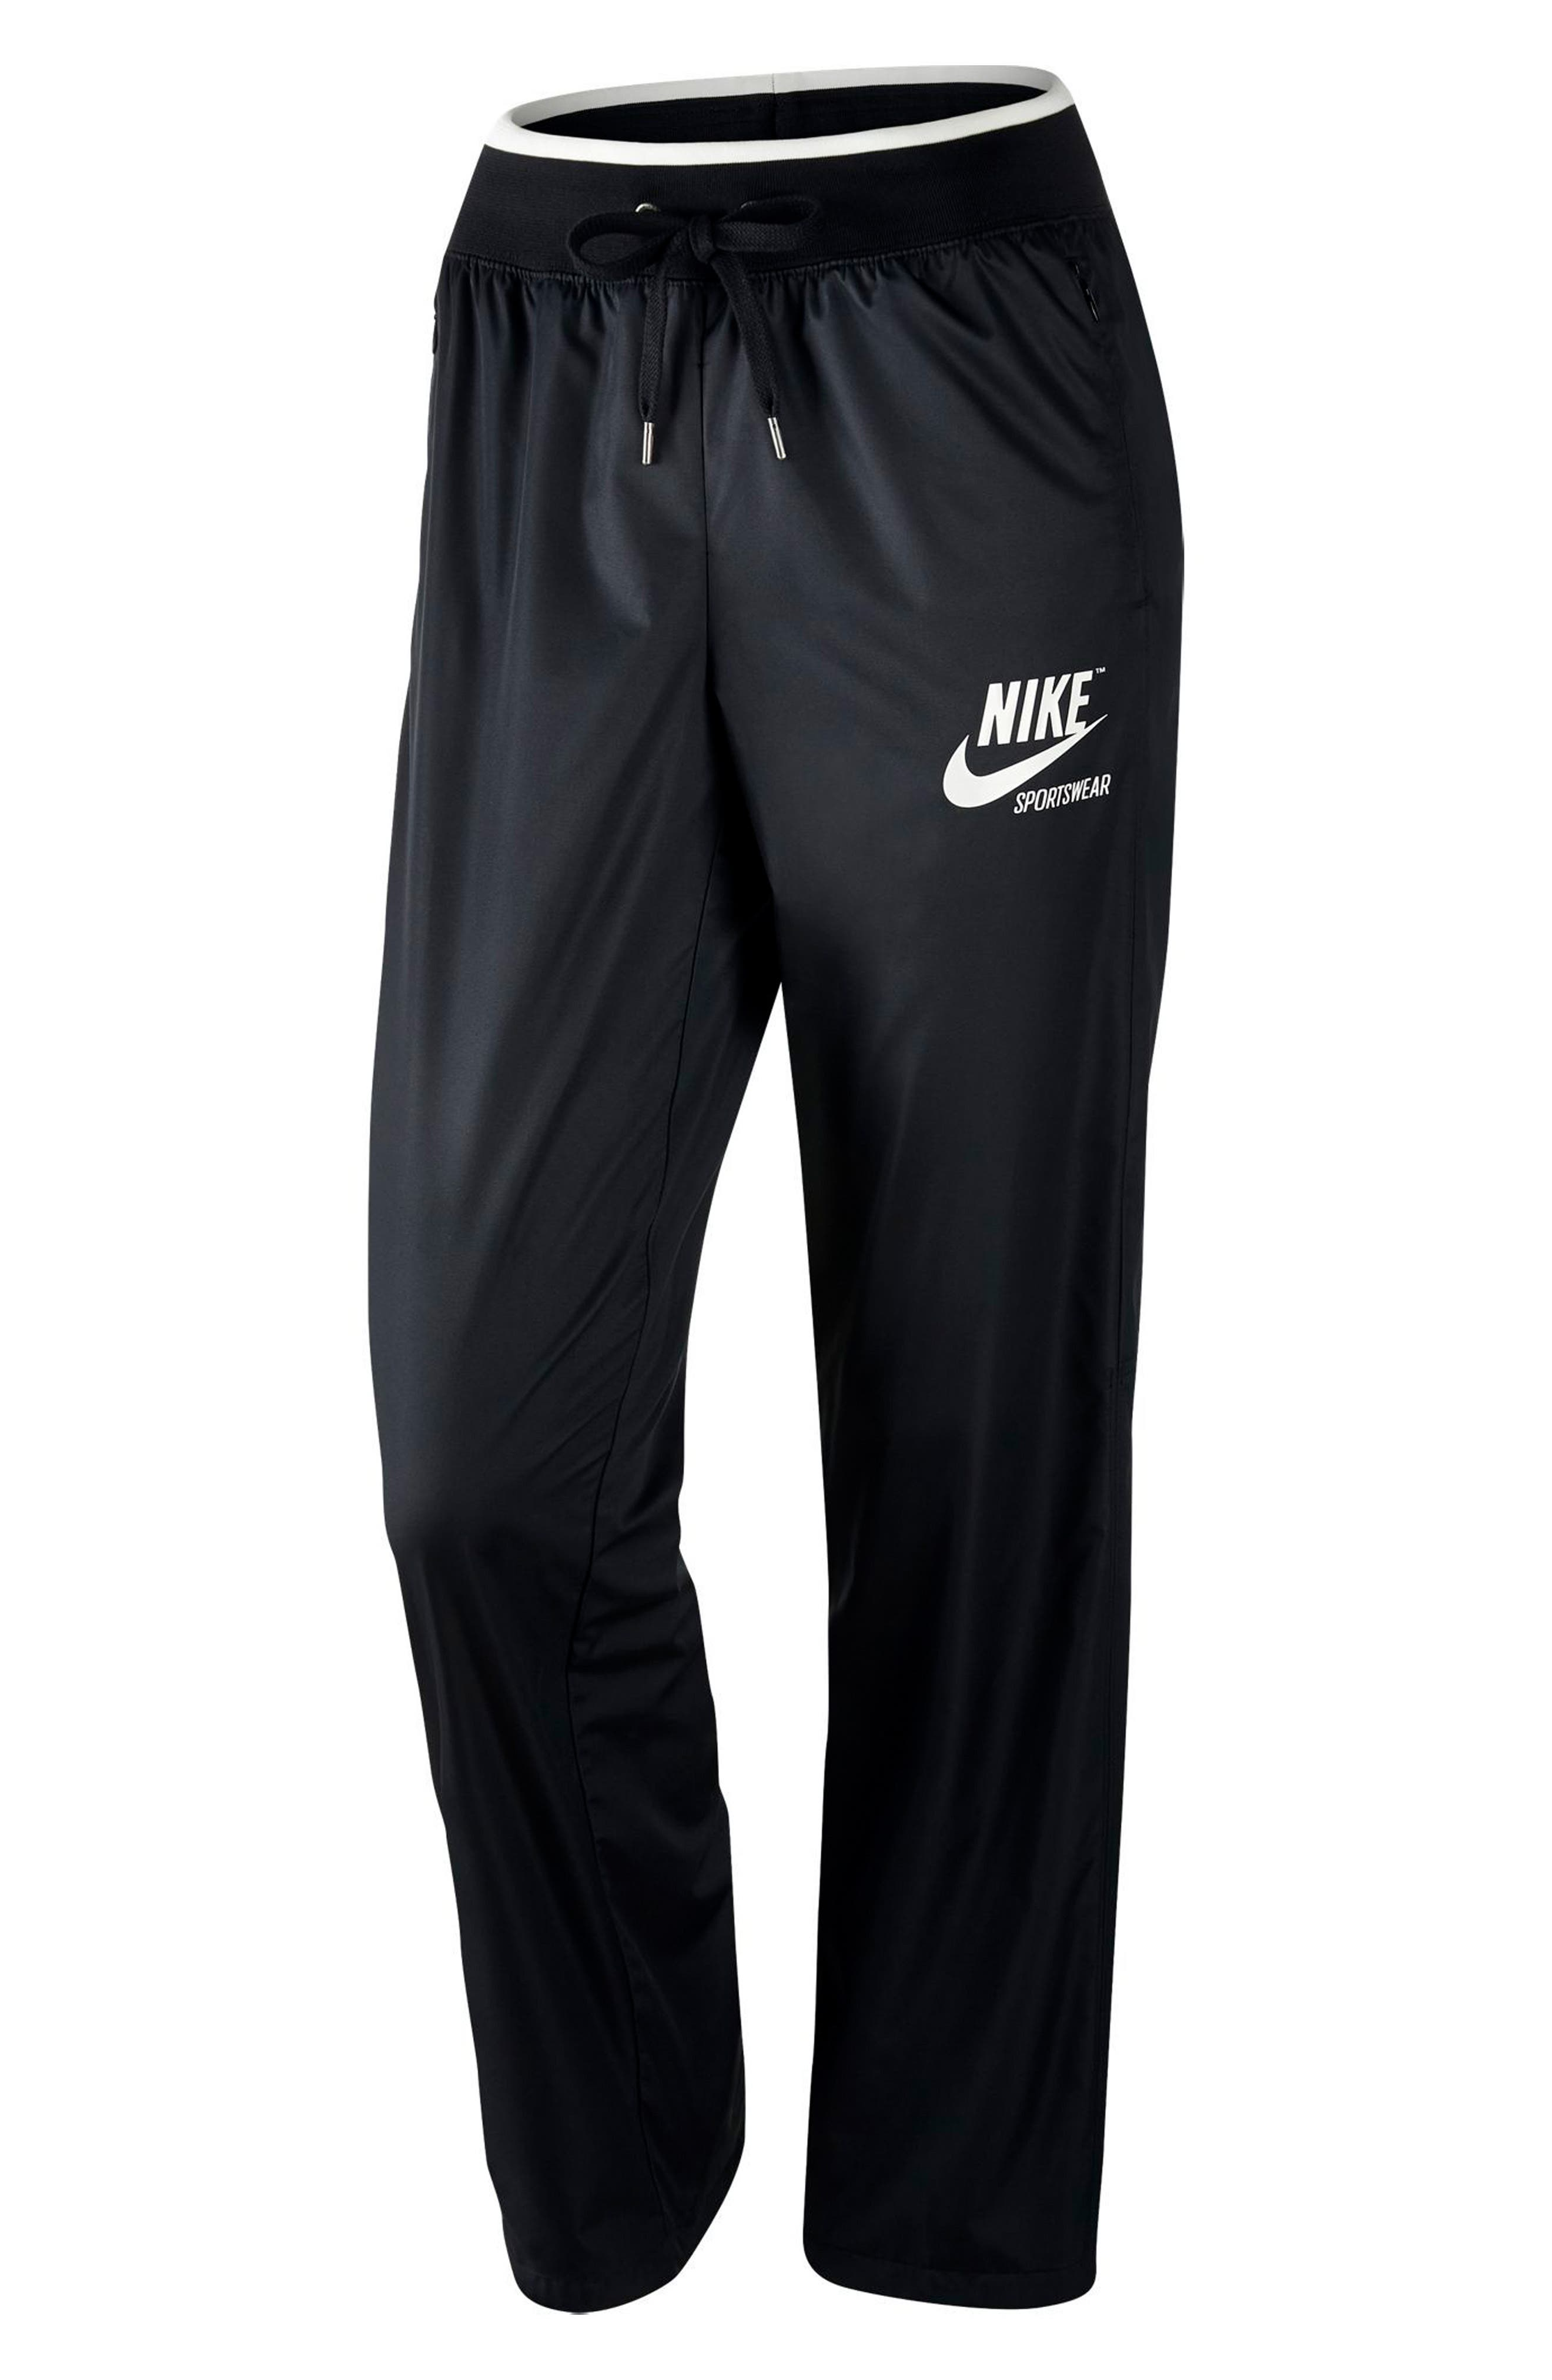 Sportswear Women's Stretch Faille Pants,                             Alternate thumbnail 5, color,                             BLACK